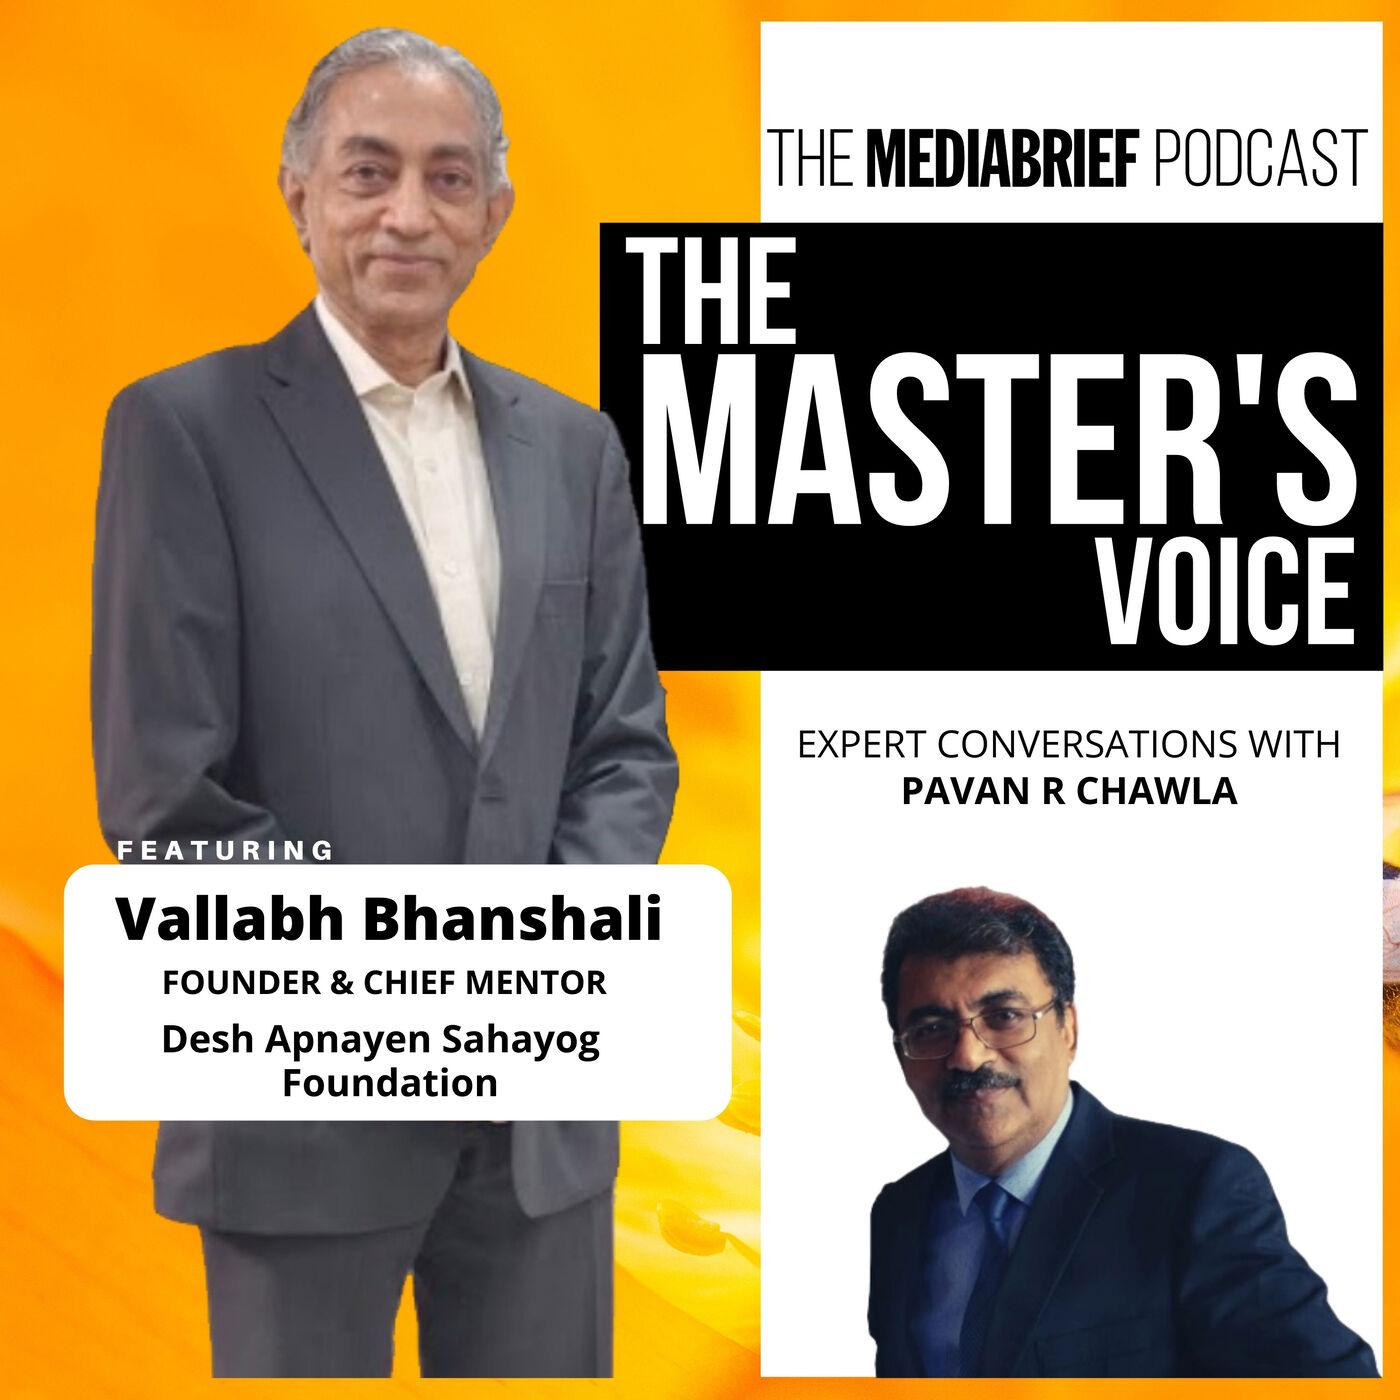 PODCAST - Vallabh Bhanshali of Desh Apnayen Foundation on The Master's Voice